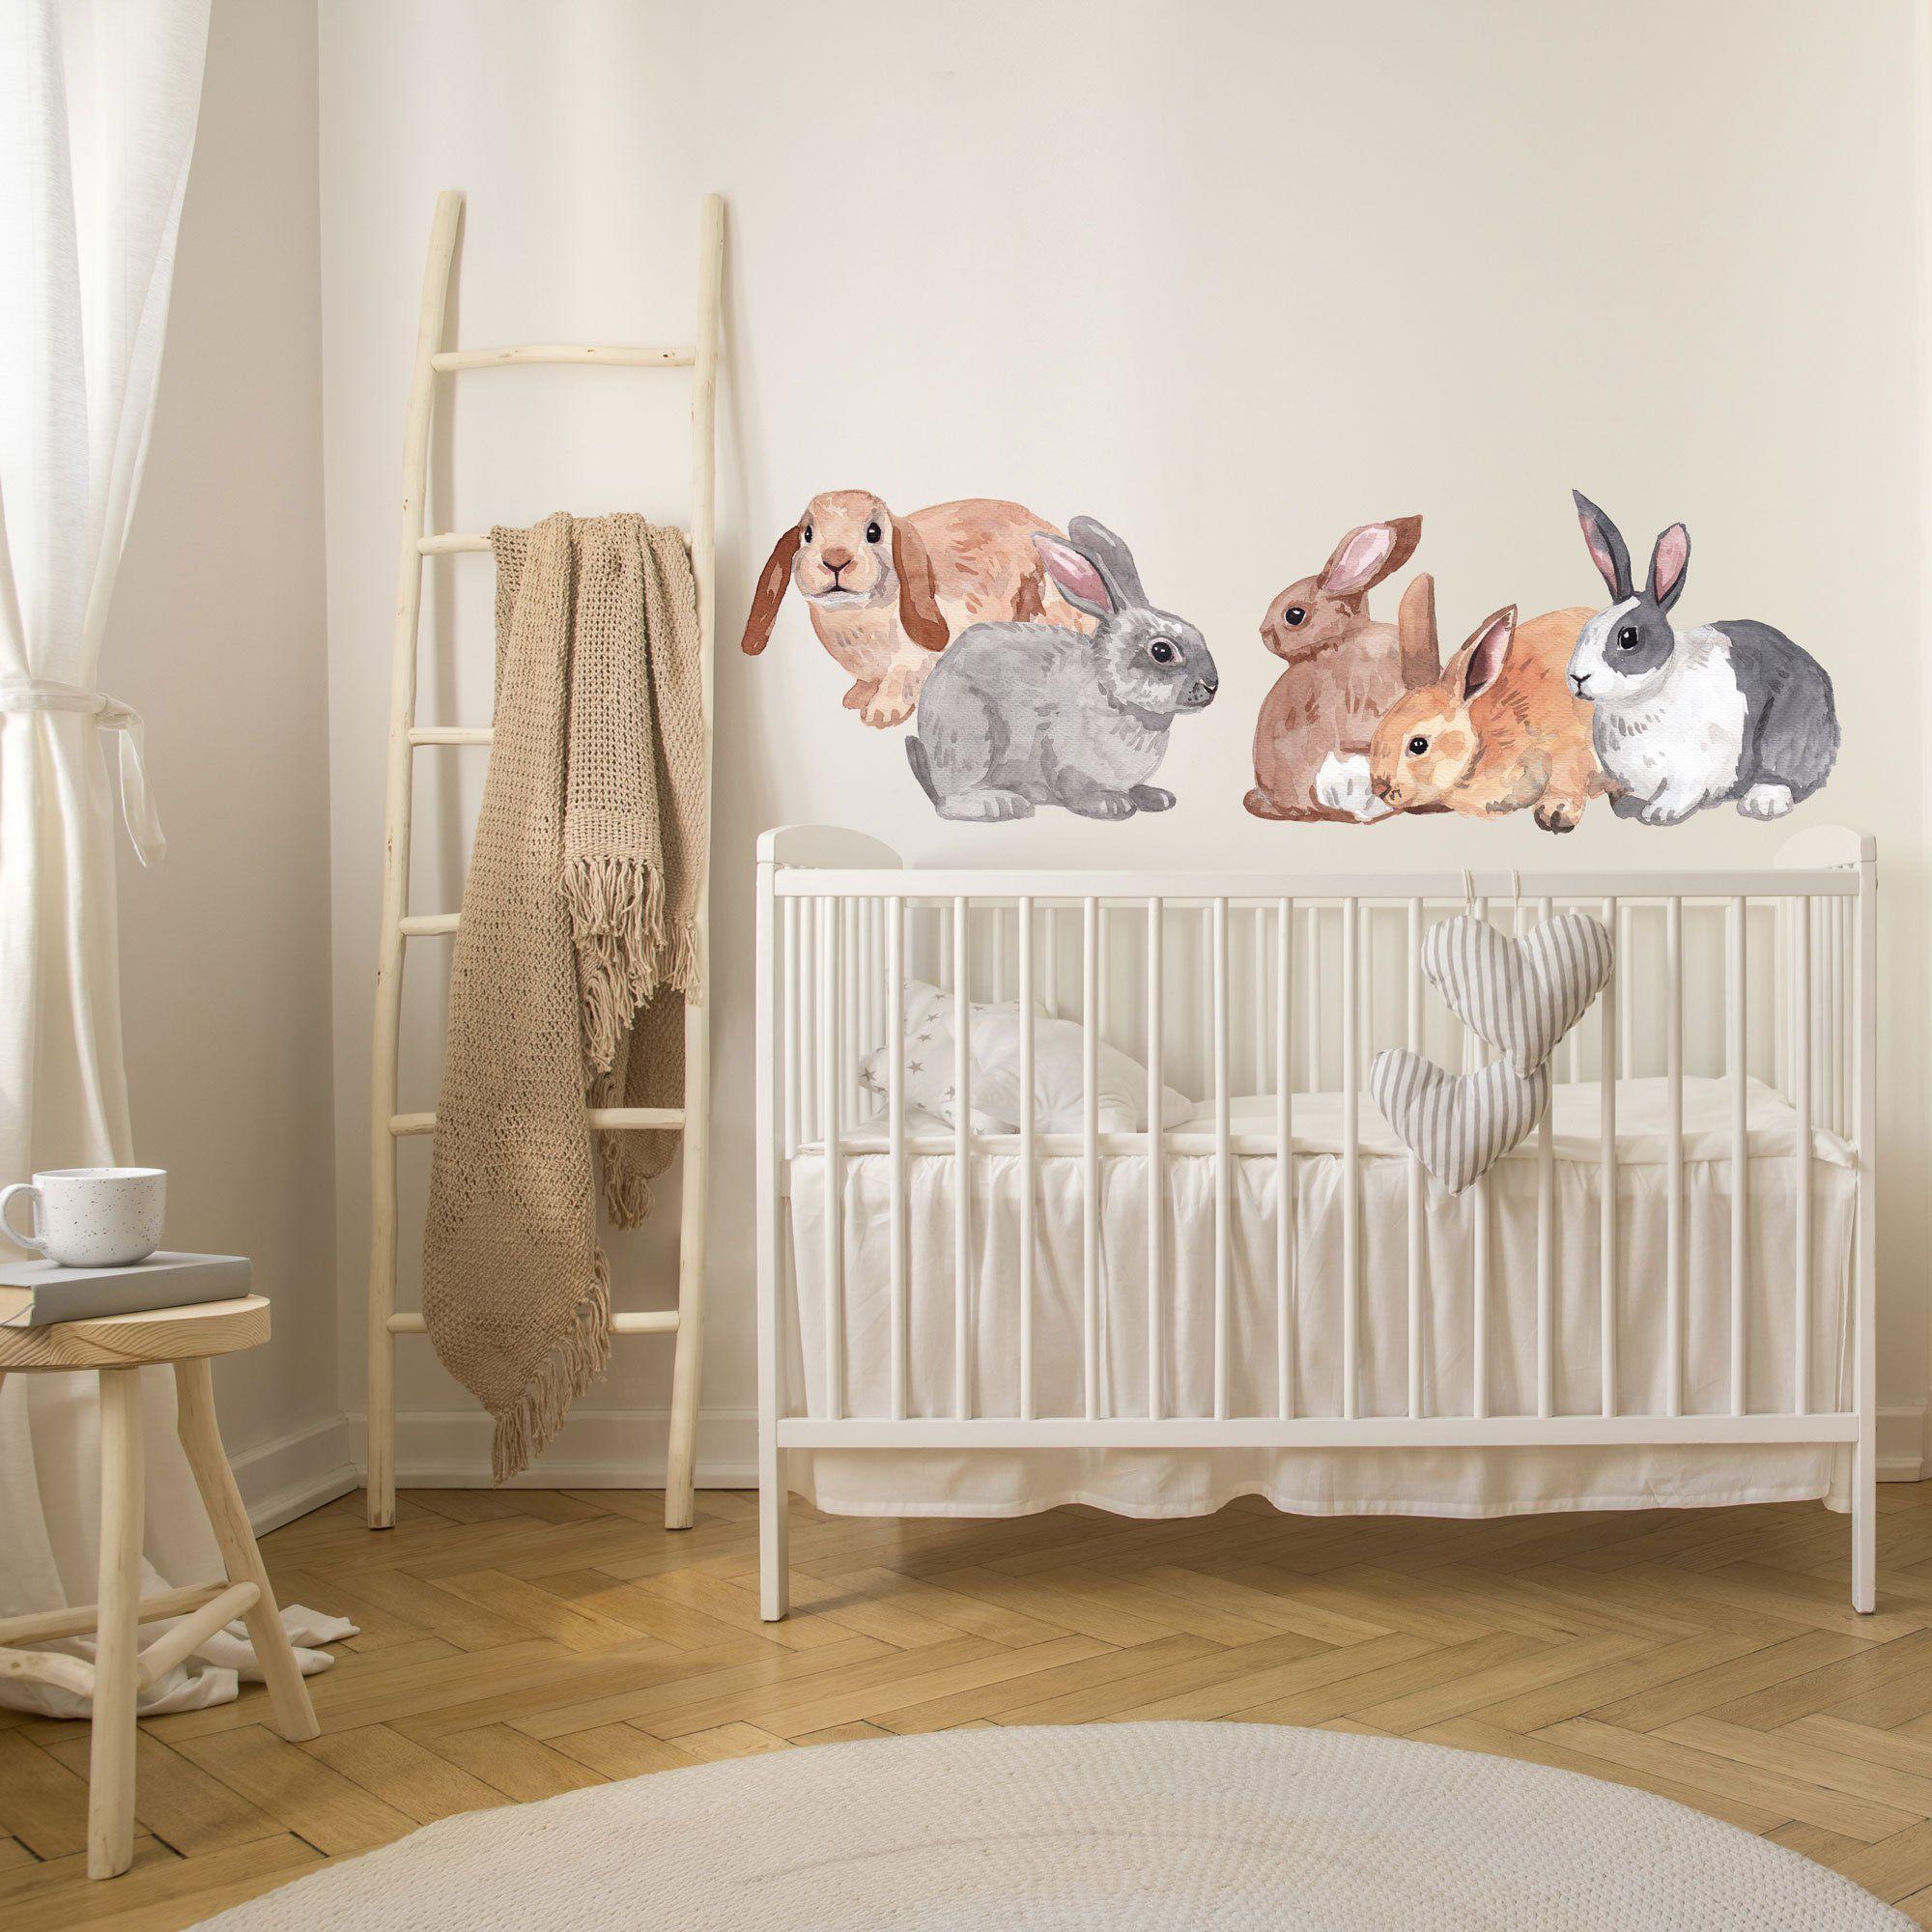 Cute Bunny Nursery Wall Decals, Set of 5 Bunnies, Made